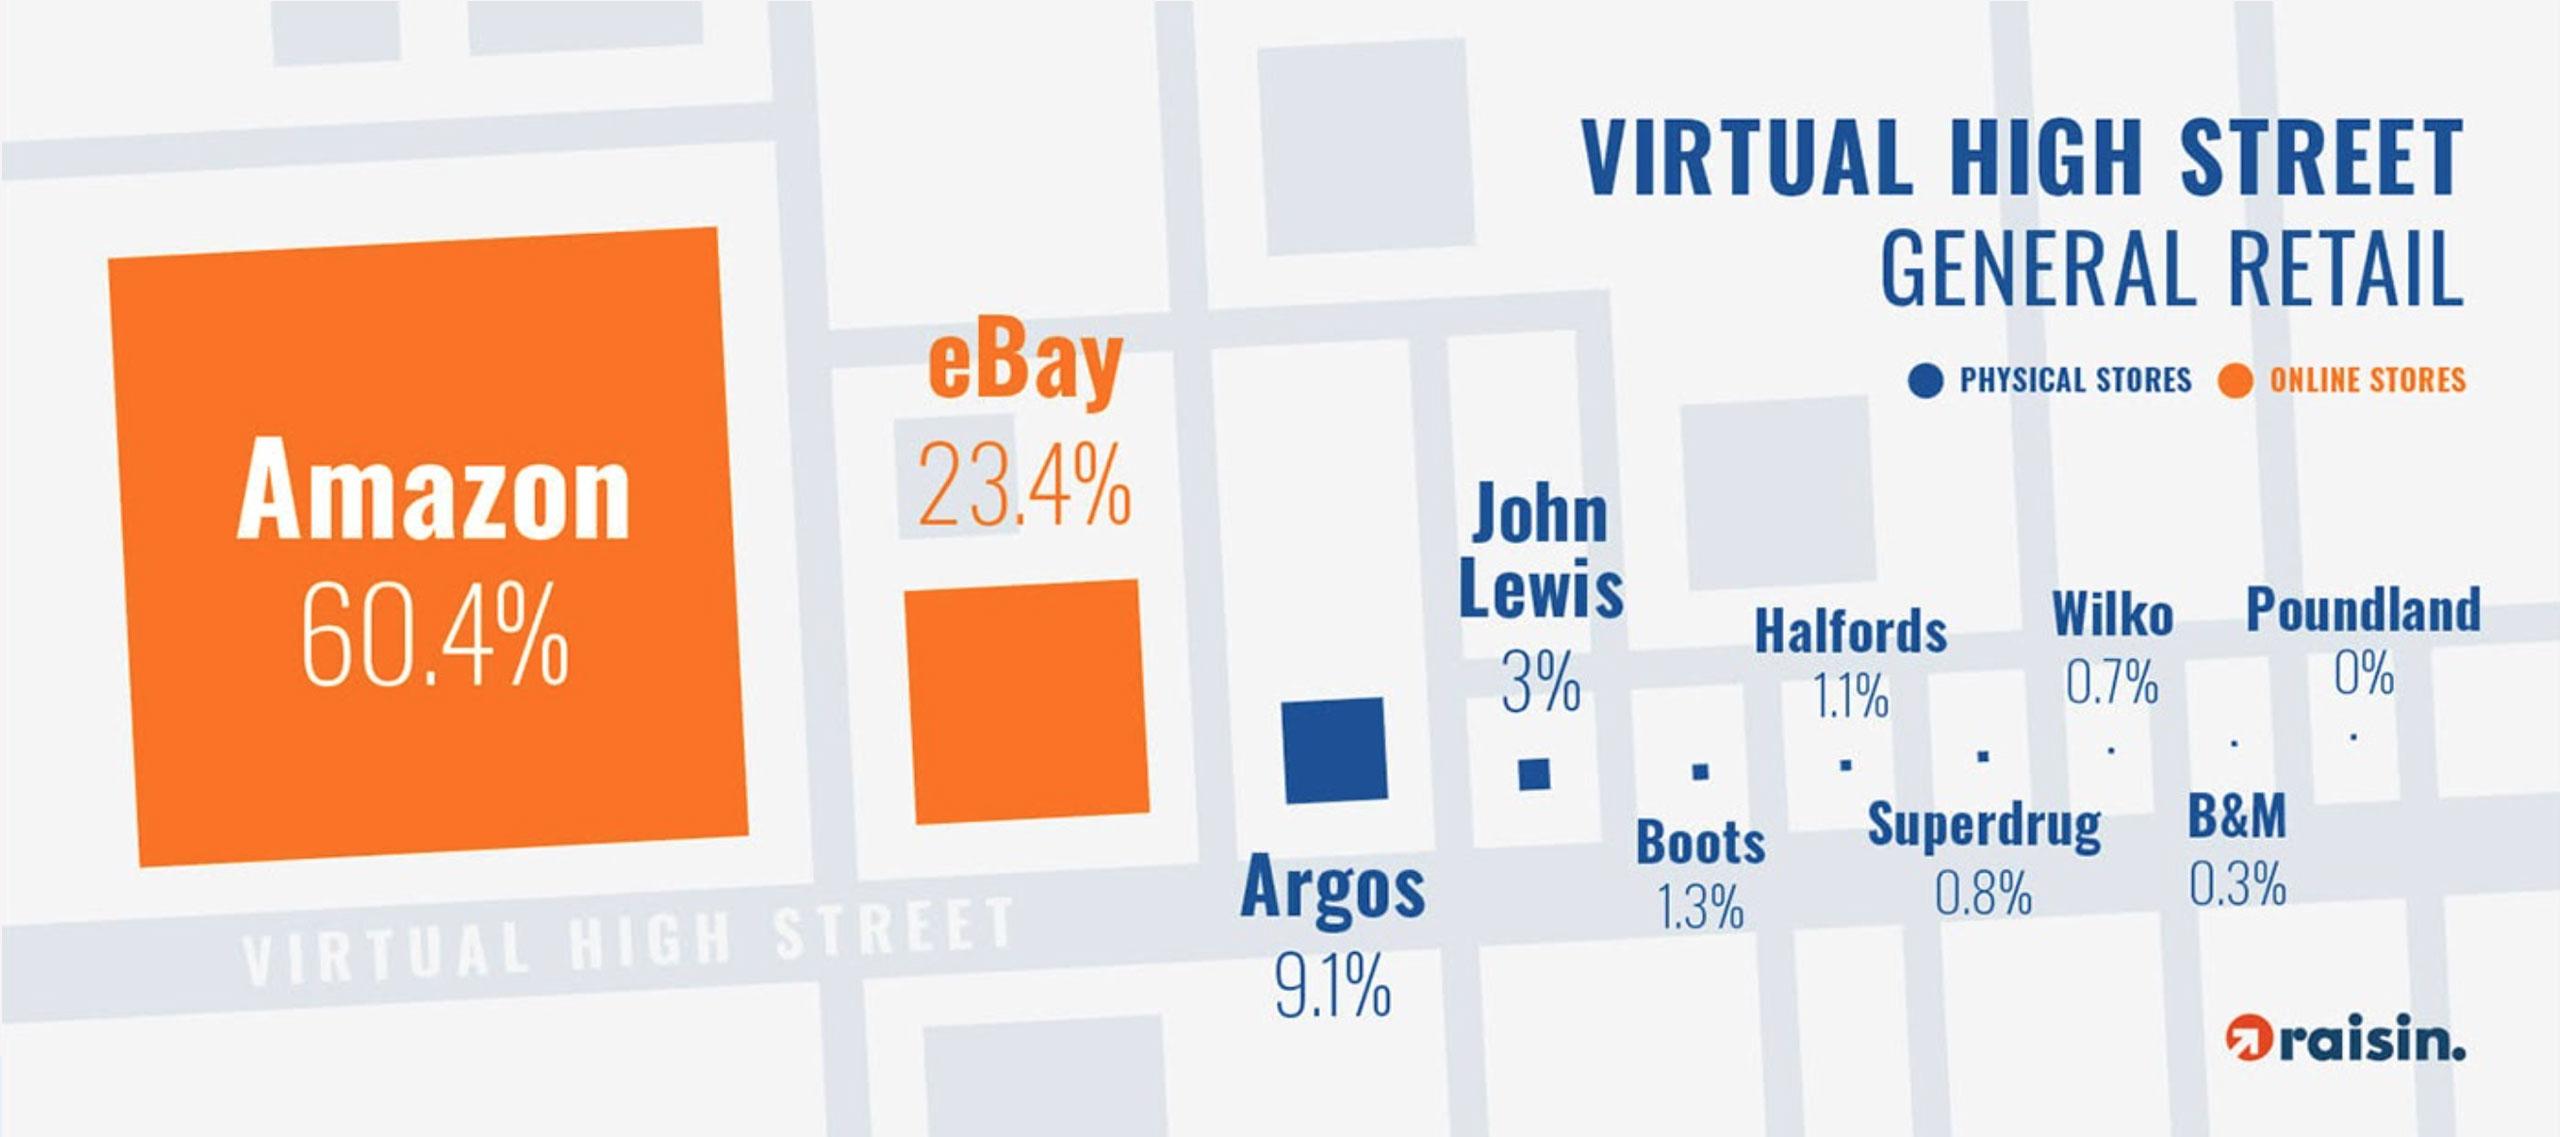 Virtual high street - general retail